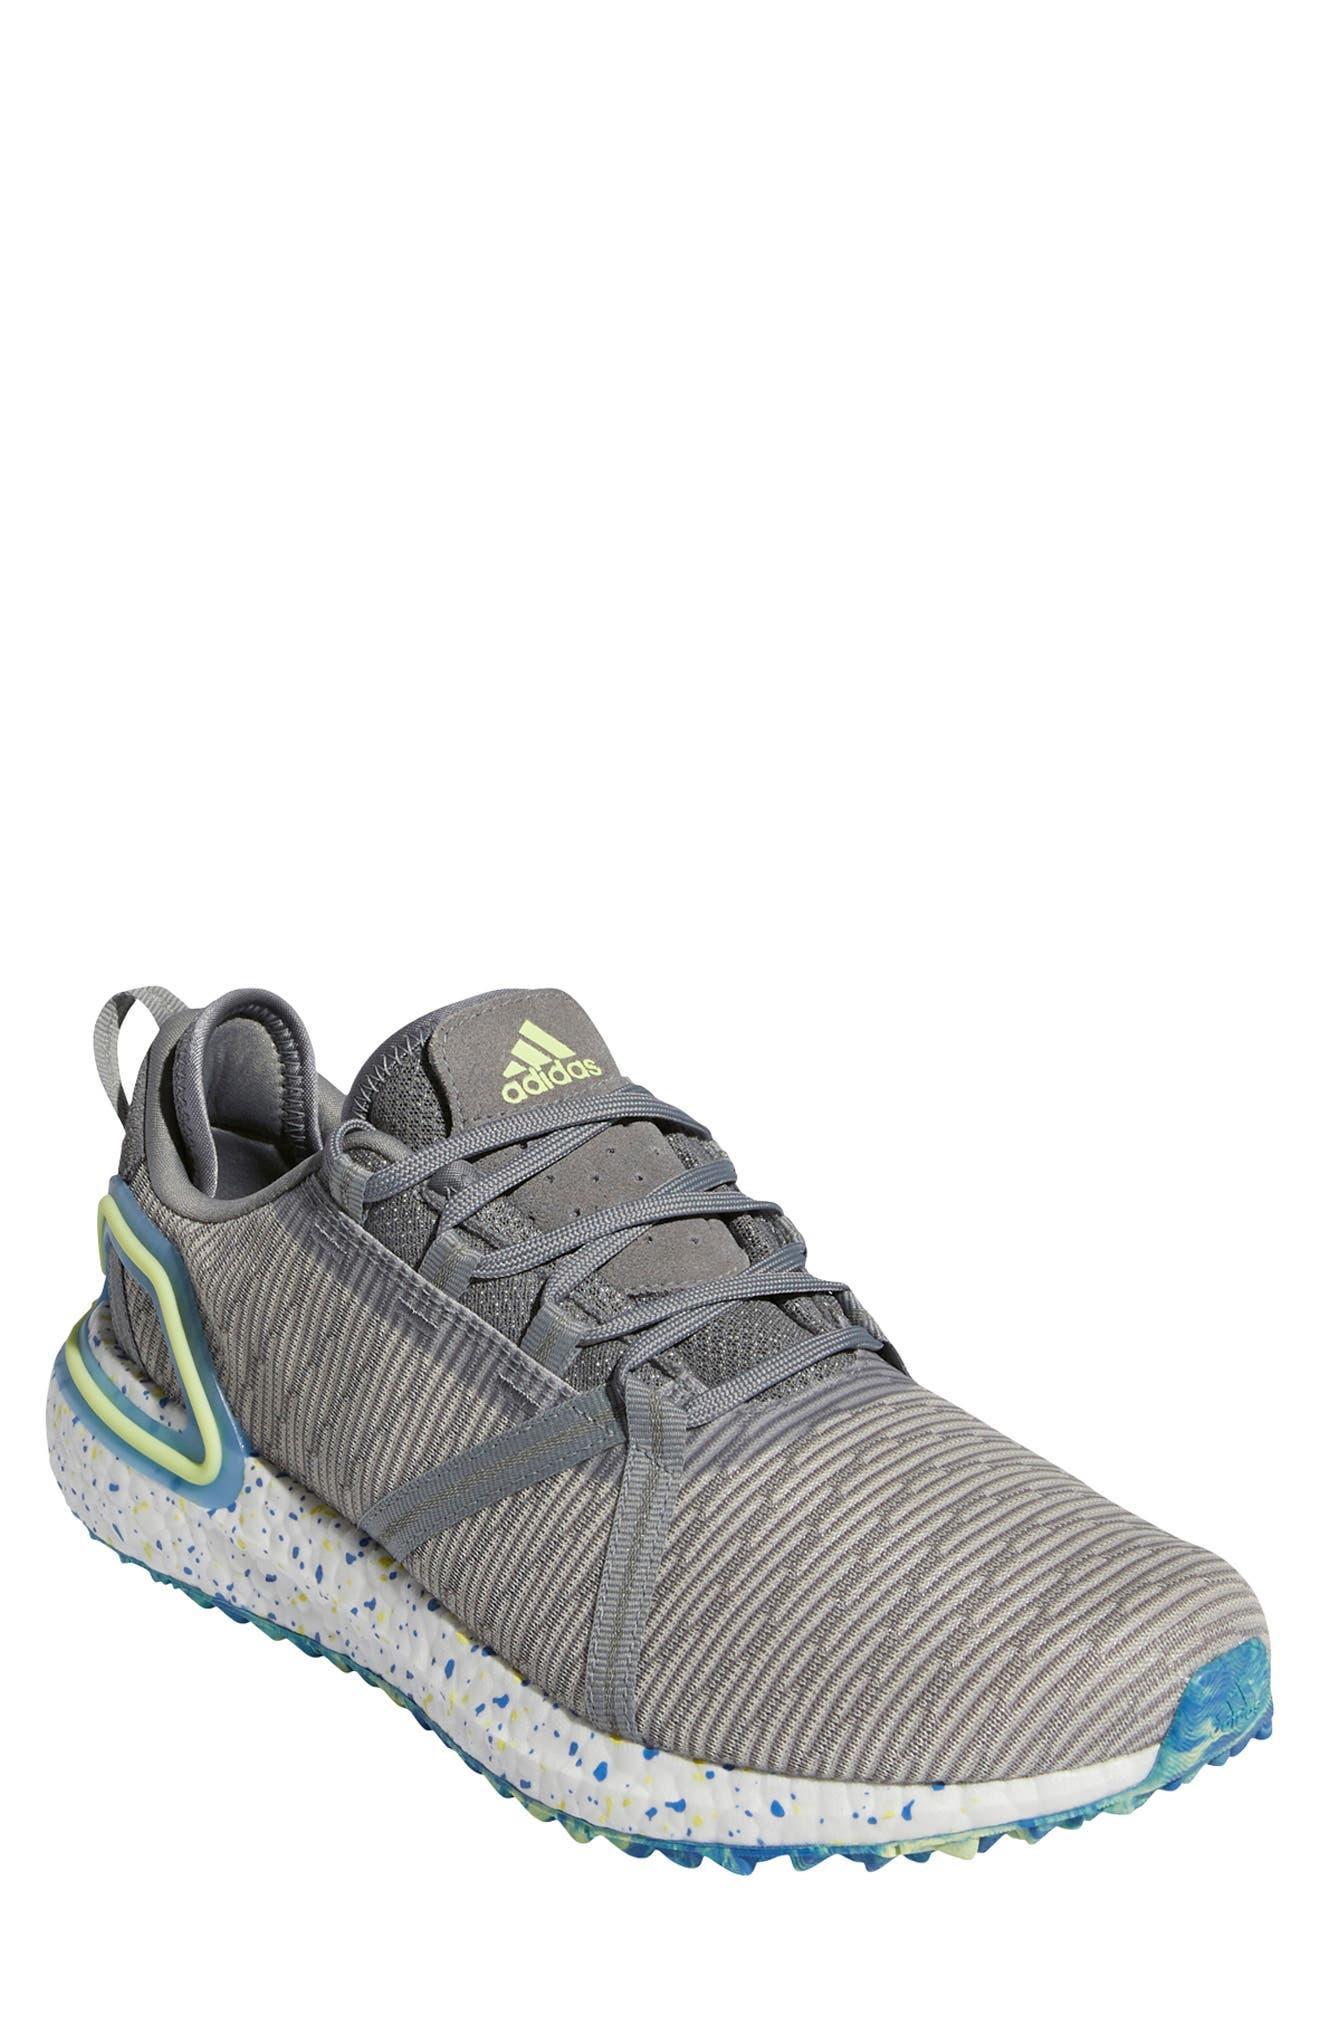 Solarthon Primegreen Water Resistant Spikeless Golf Shoe